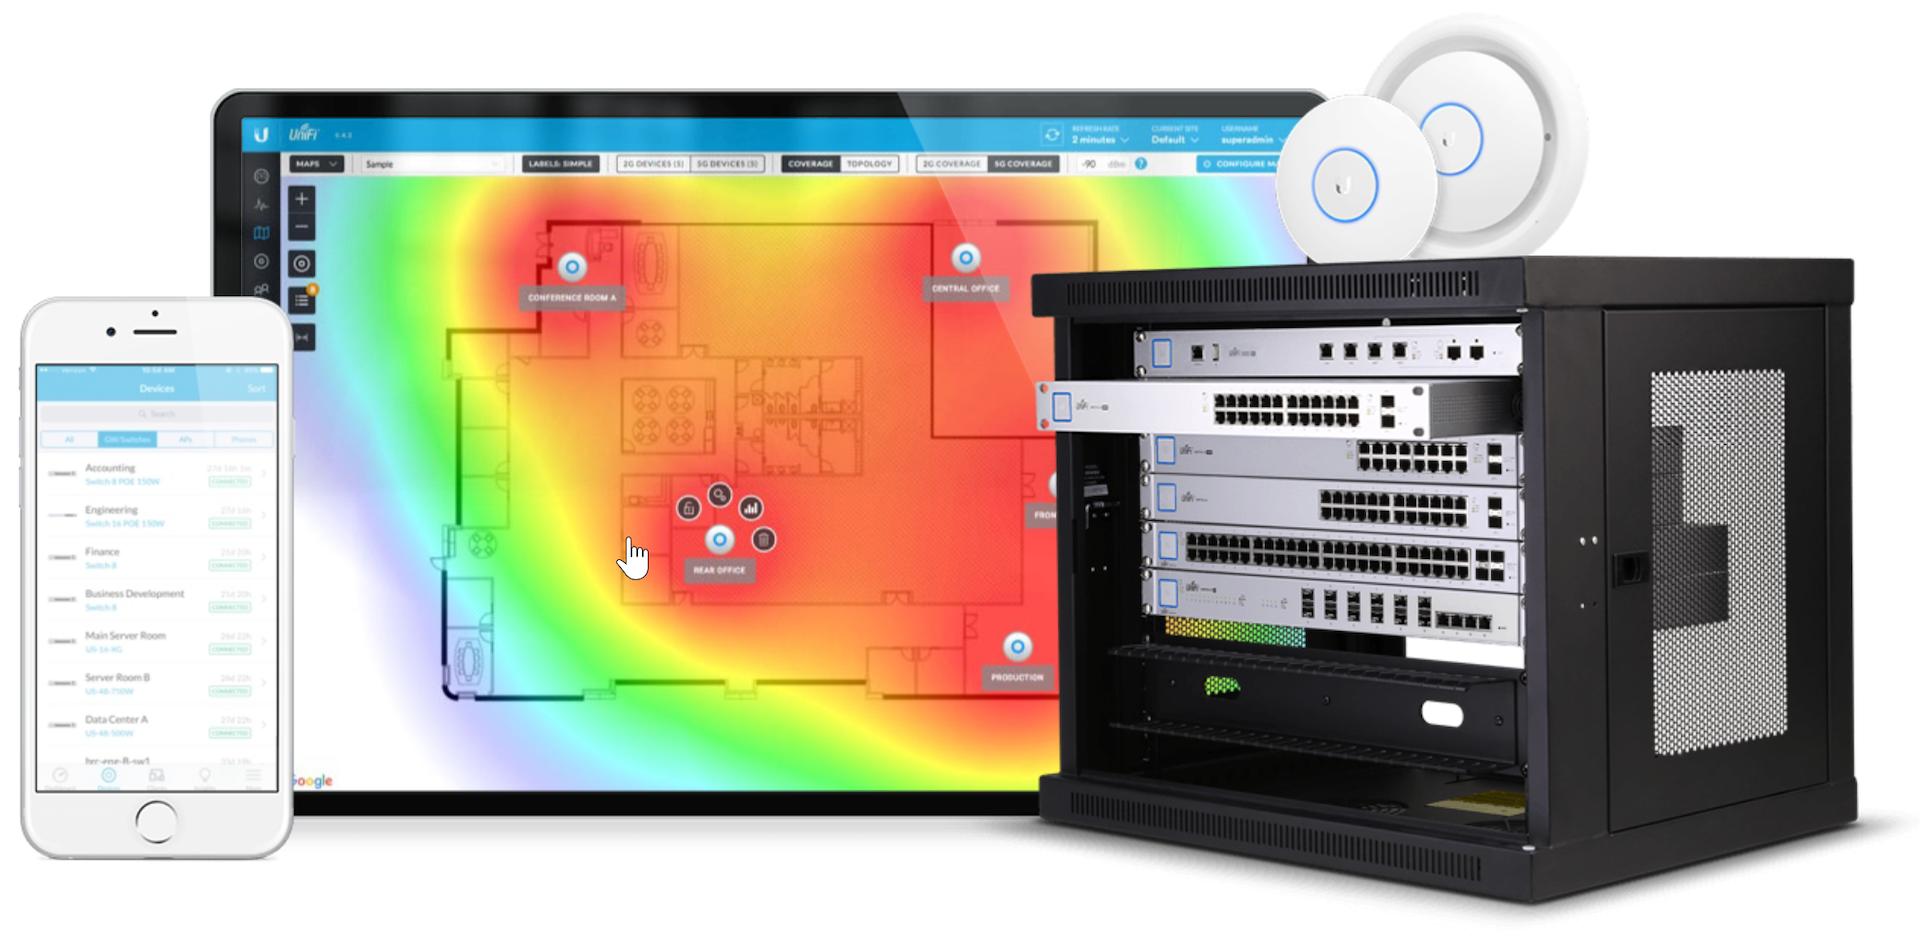 Irontec-managed-wifi